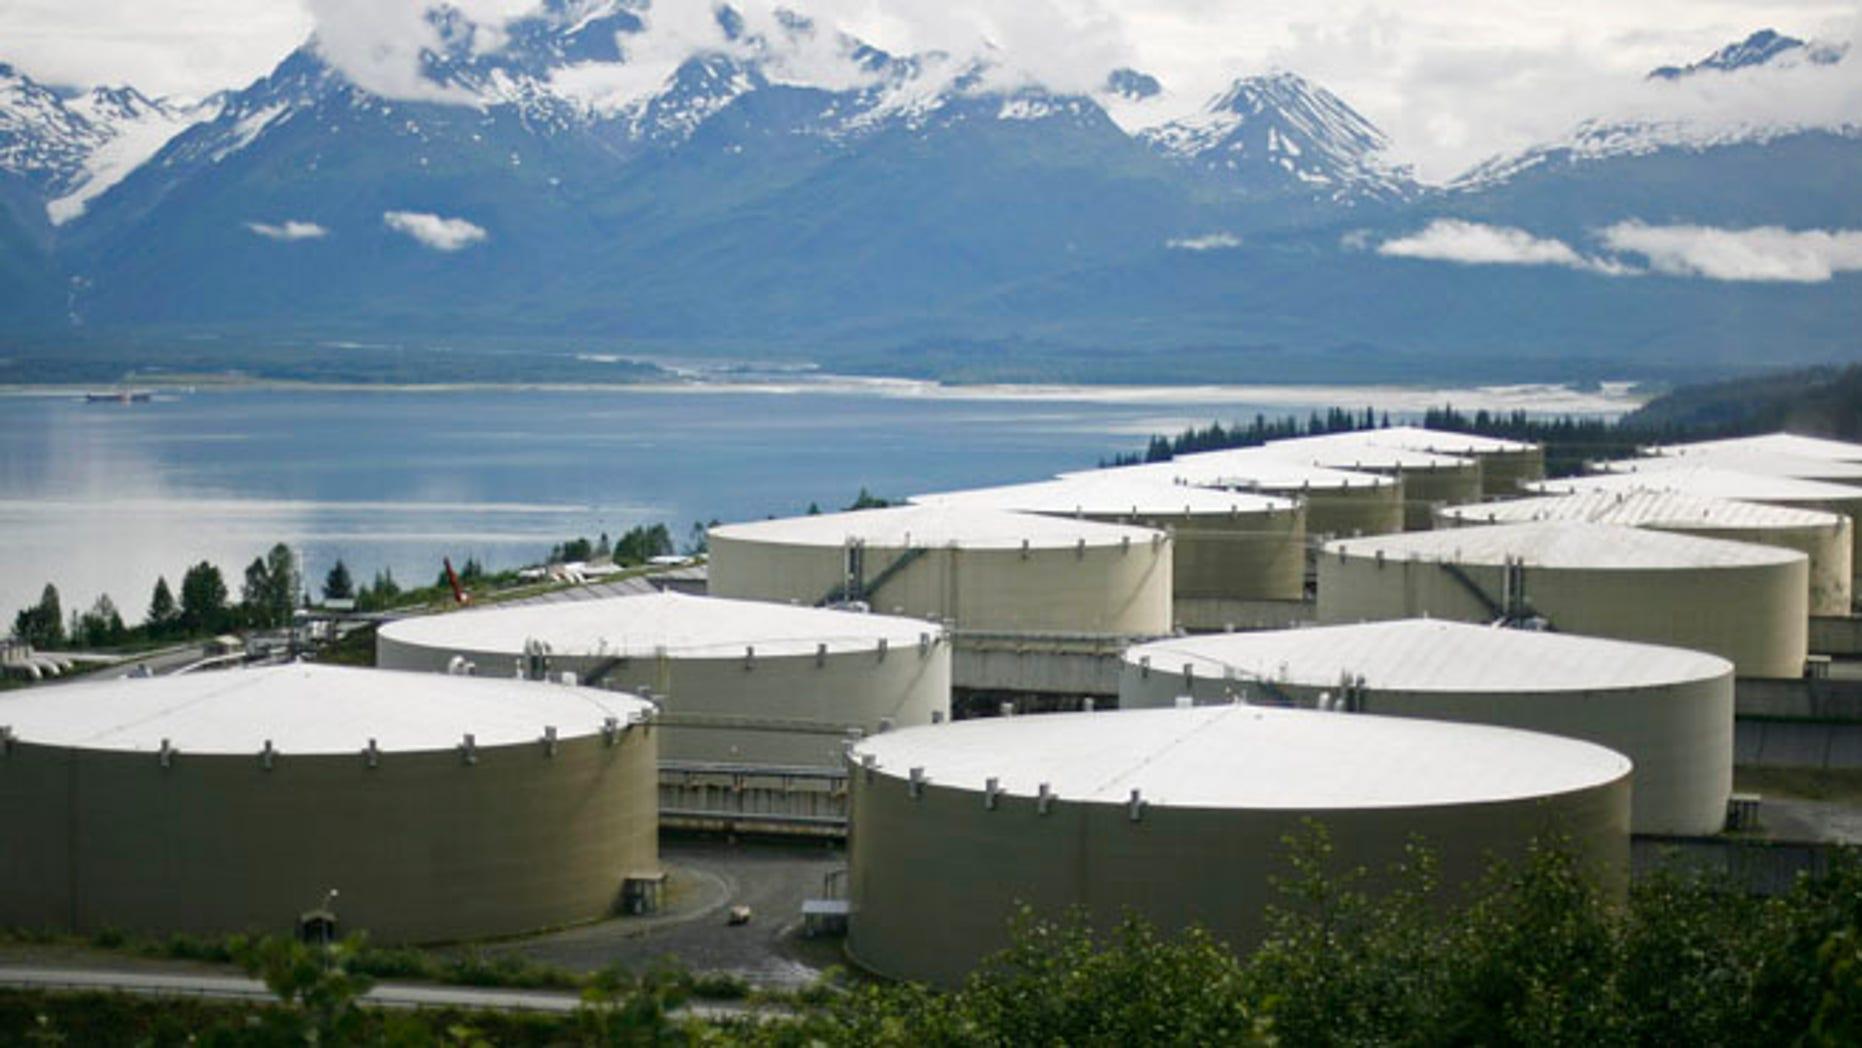 FILE: UNDATED: A field of oil storge tanks at the Trans-Alaska Pipeline Marine Terminal in Valdez, Alaska. (REUTERS)